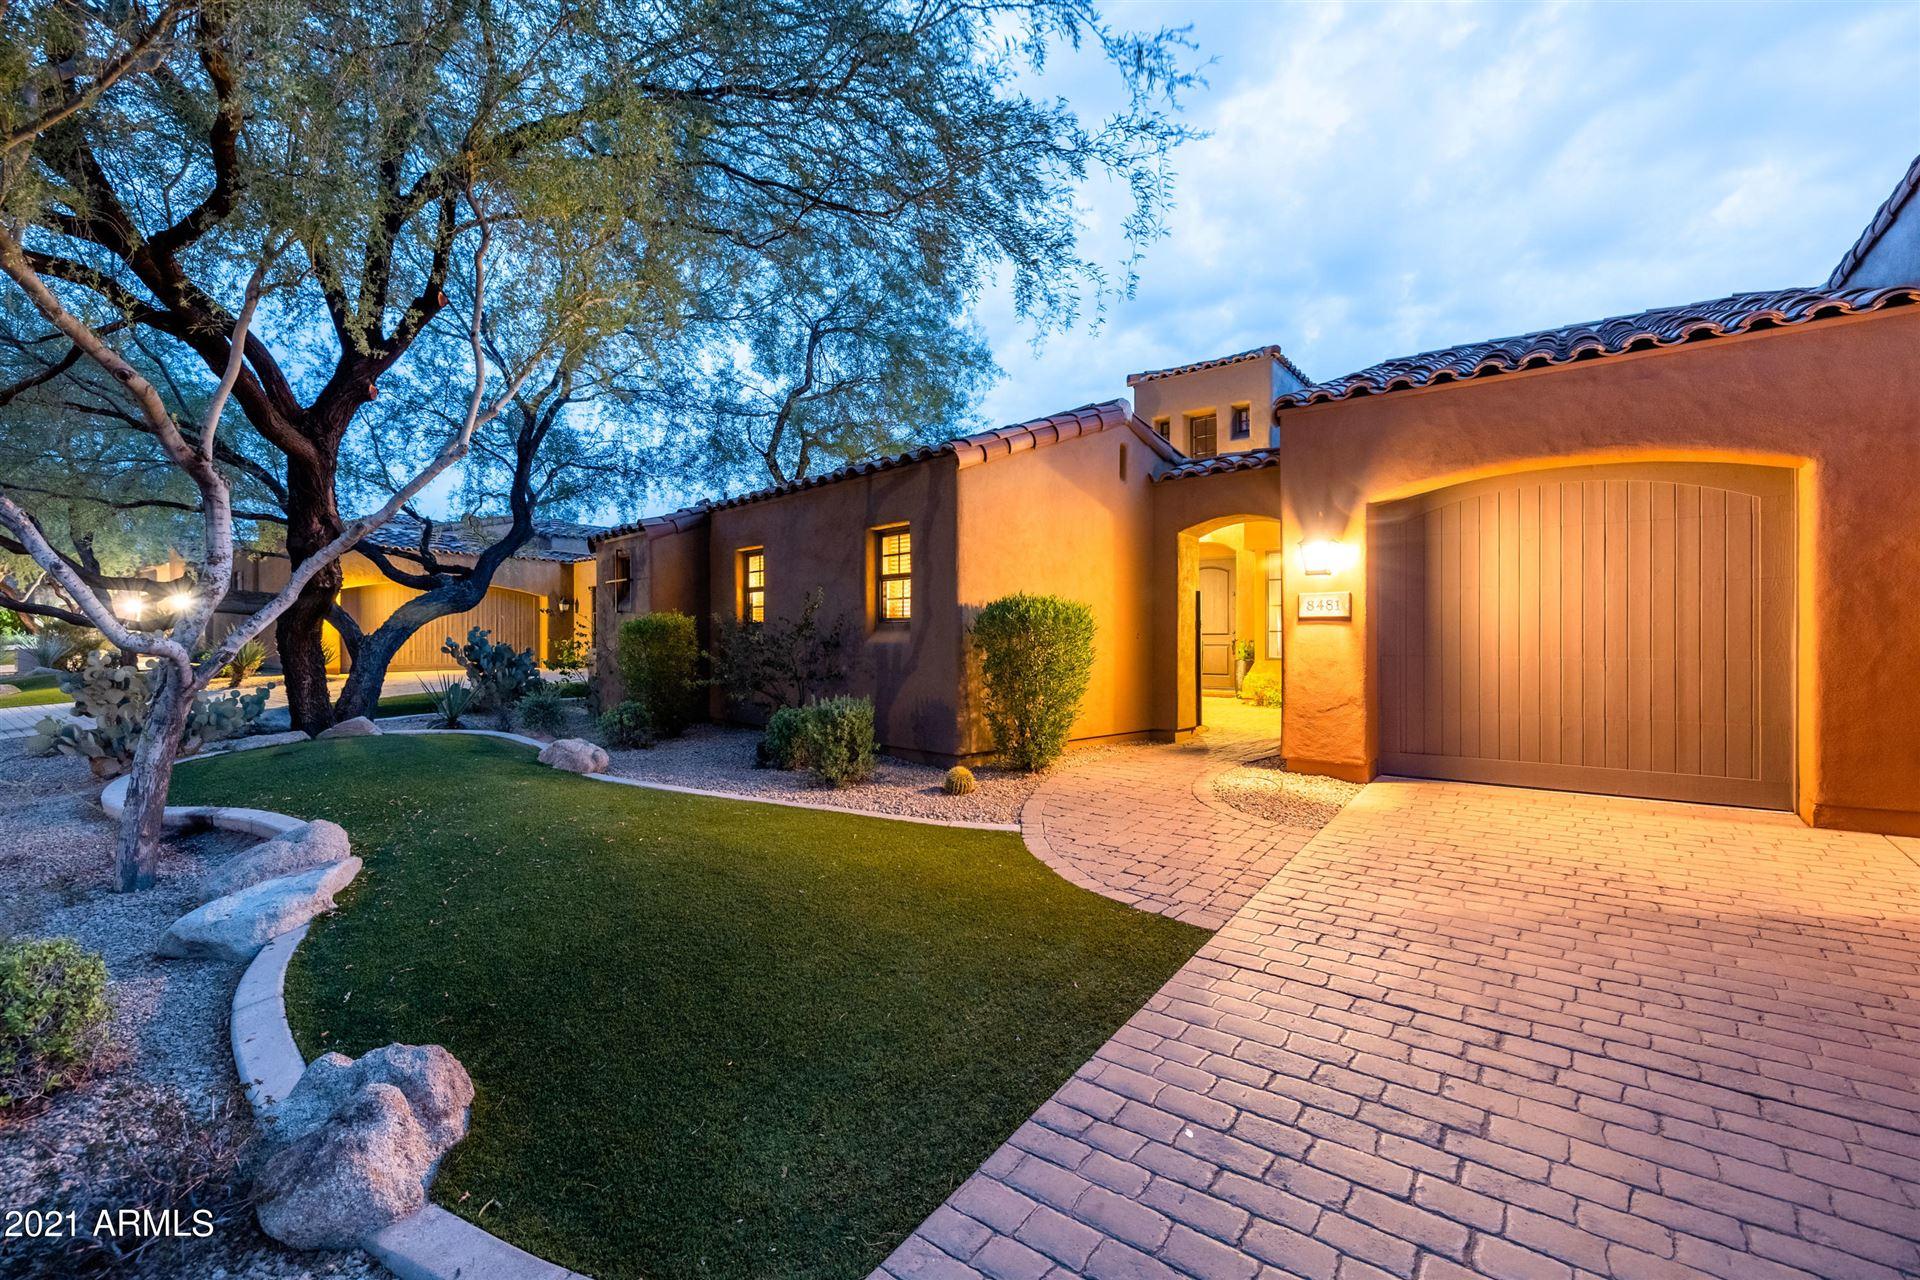 Photo of 8481 E GILDED PERCH Drive, Scottsdale, AZ 85255 (MLS # 6269139)